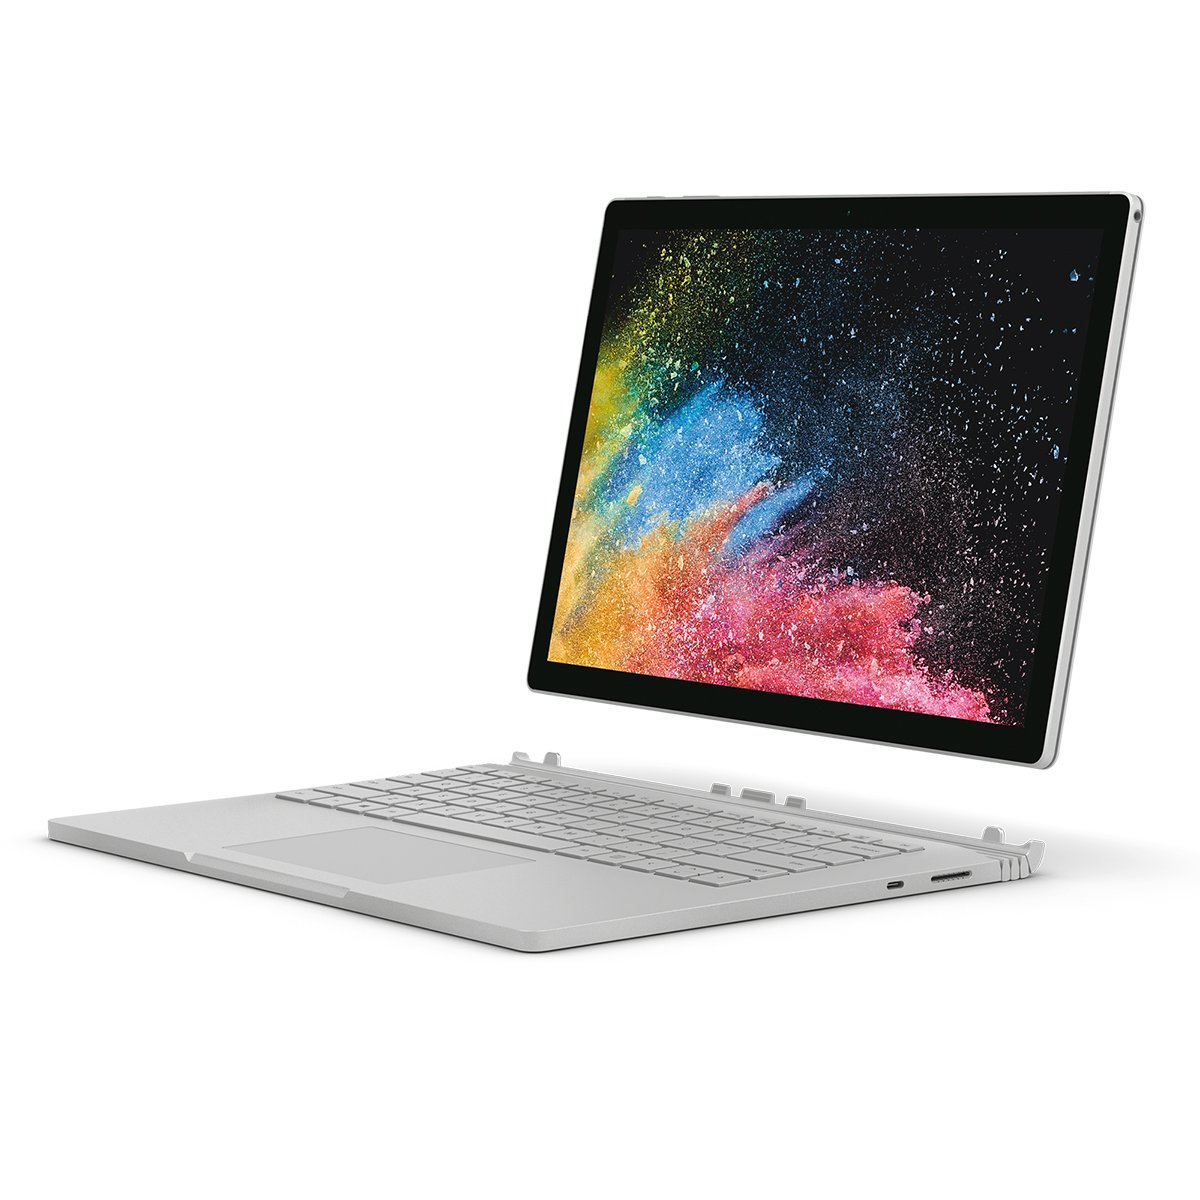 Microsoft Surface Book 2 (Intel Core i7, 8GB RAM, 256GB) - 13.5''